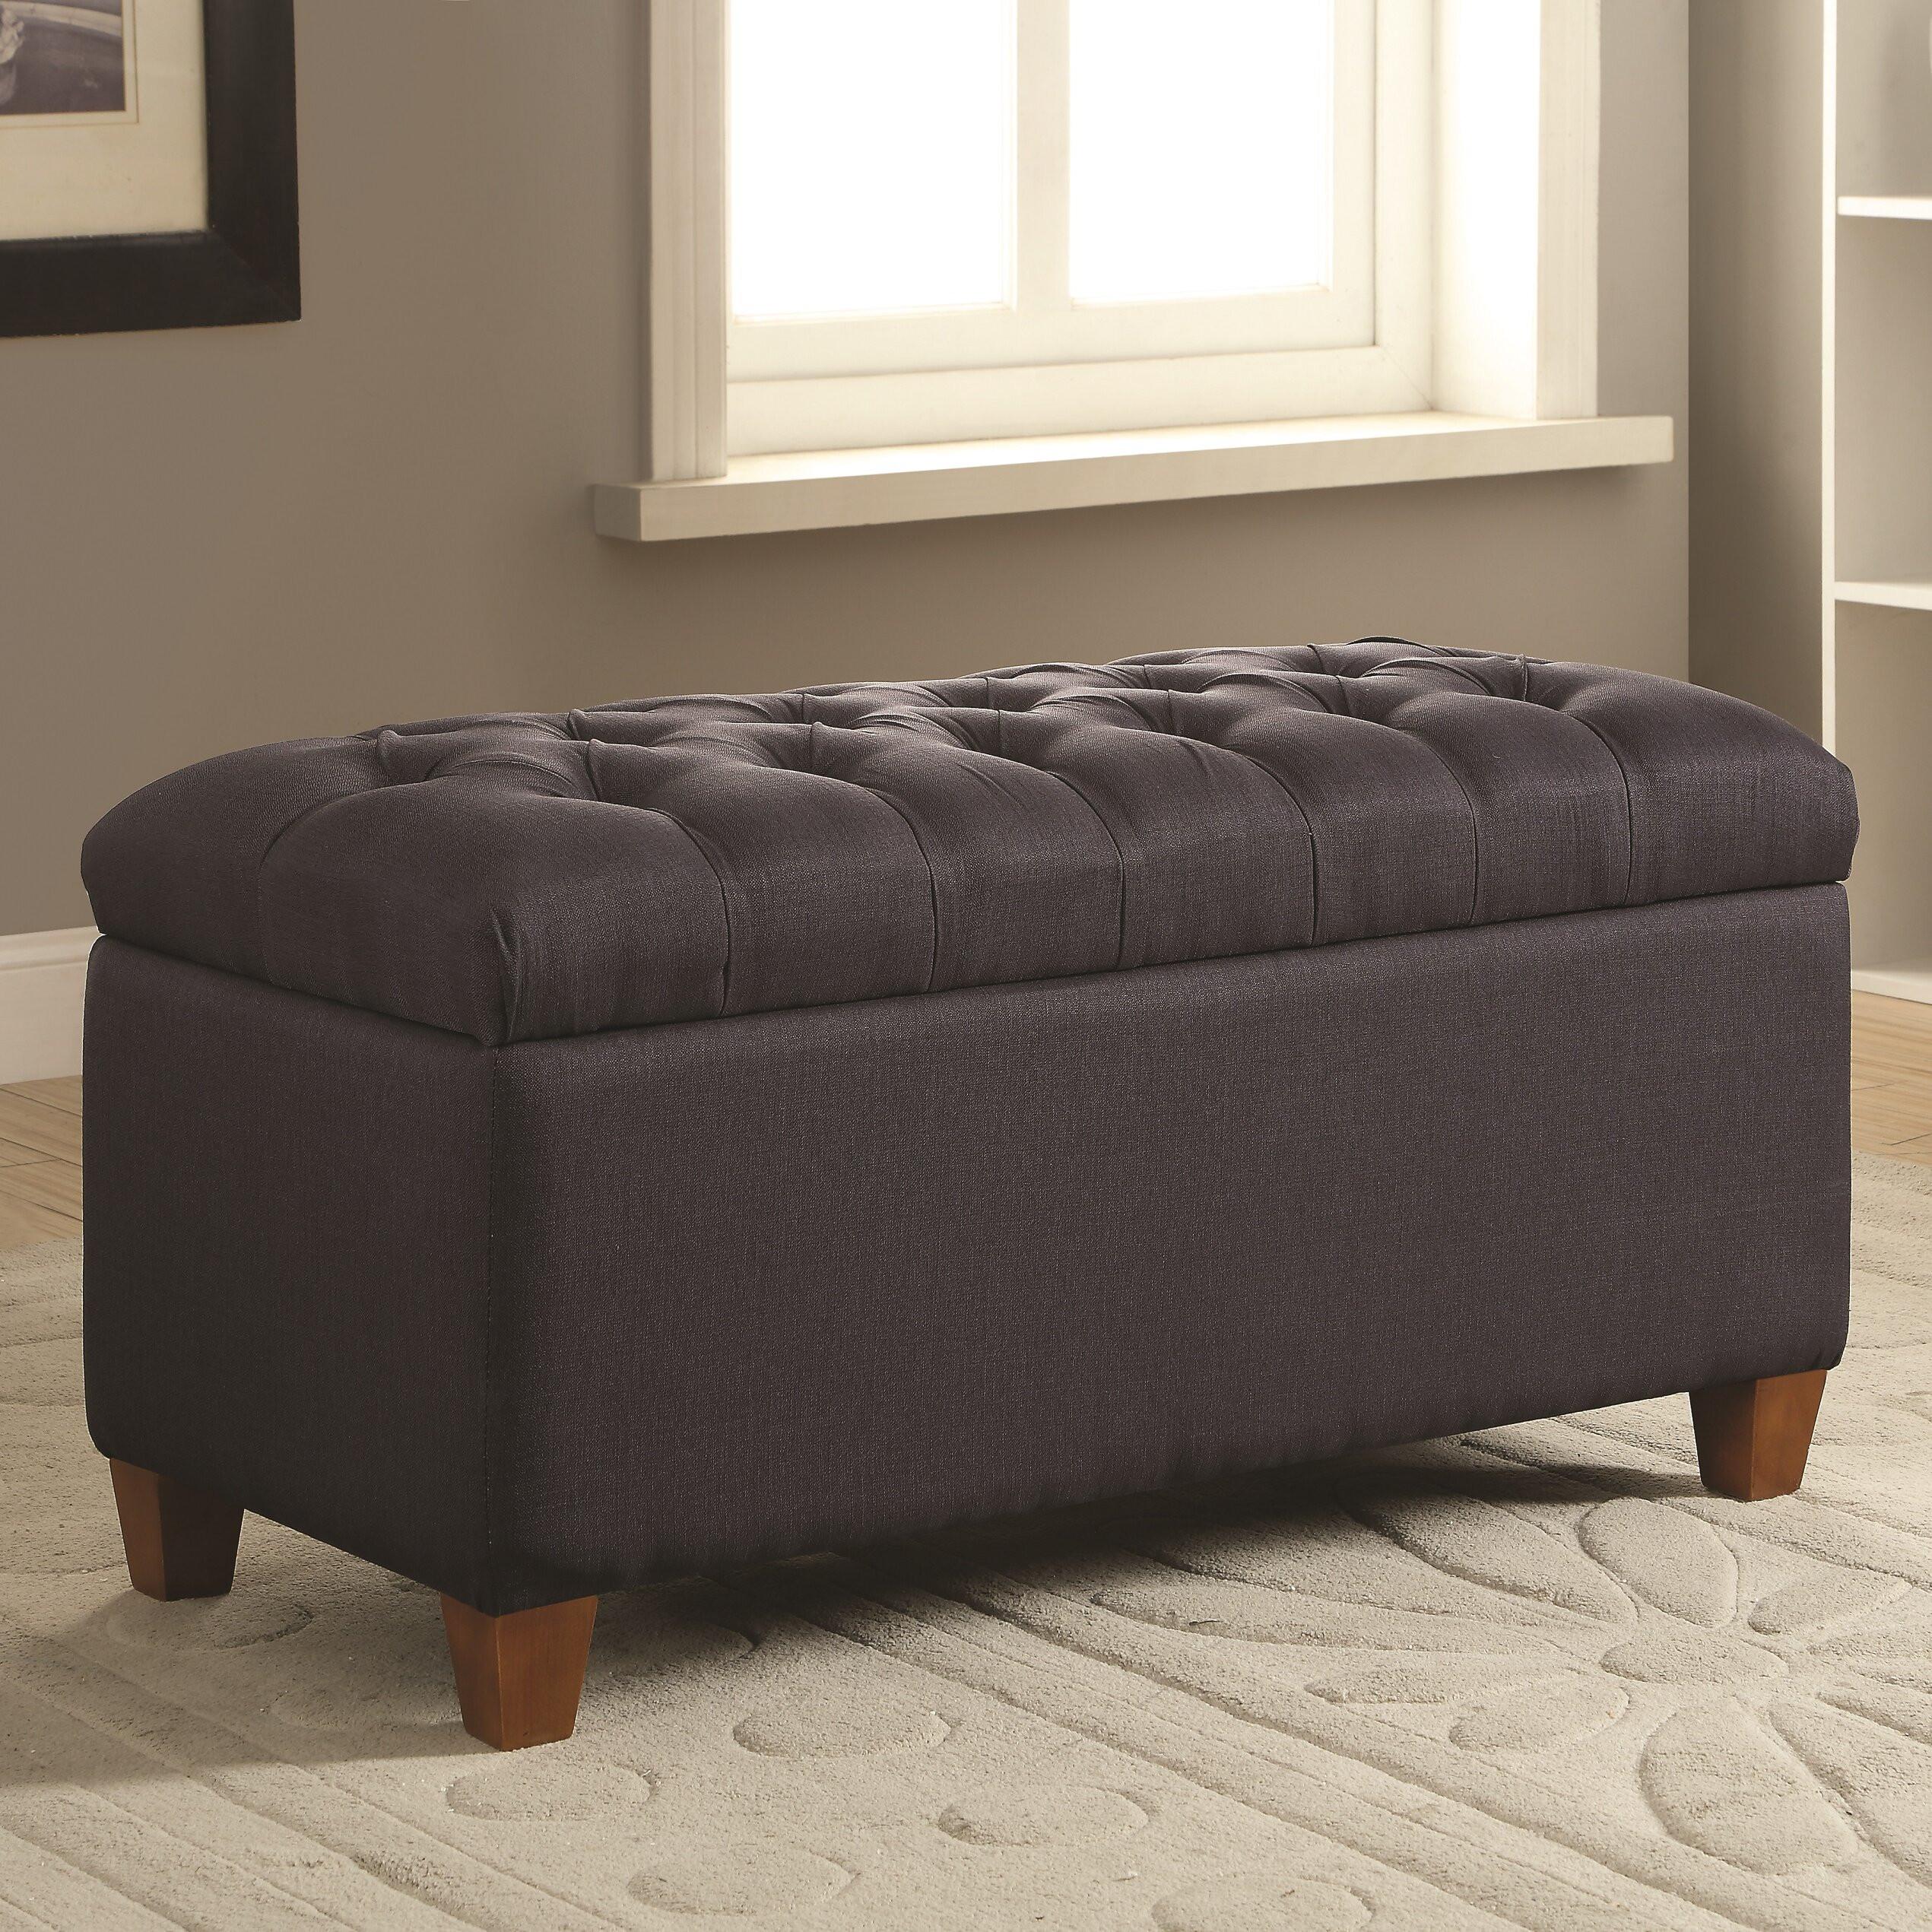 Storage Bench Bedroom  Alcott Hill Henderson Upholstered Storage Bedroom Bench